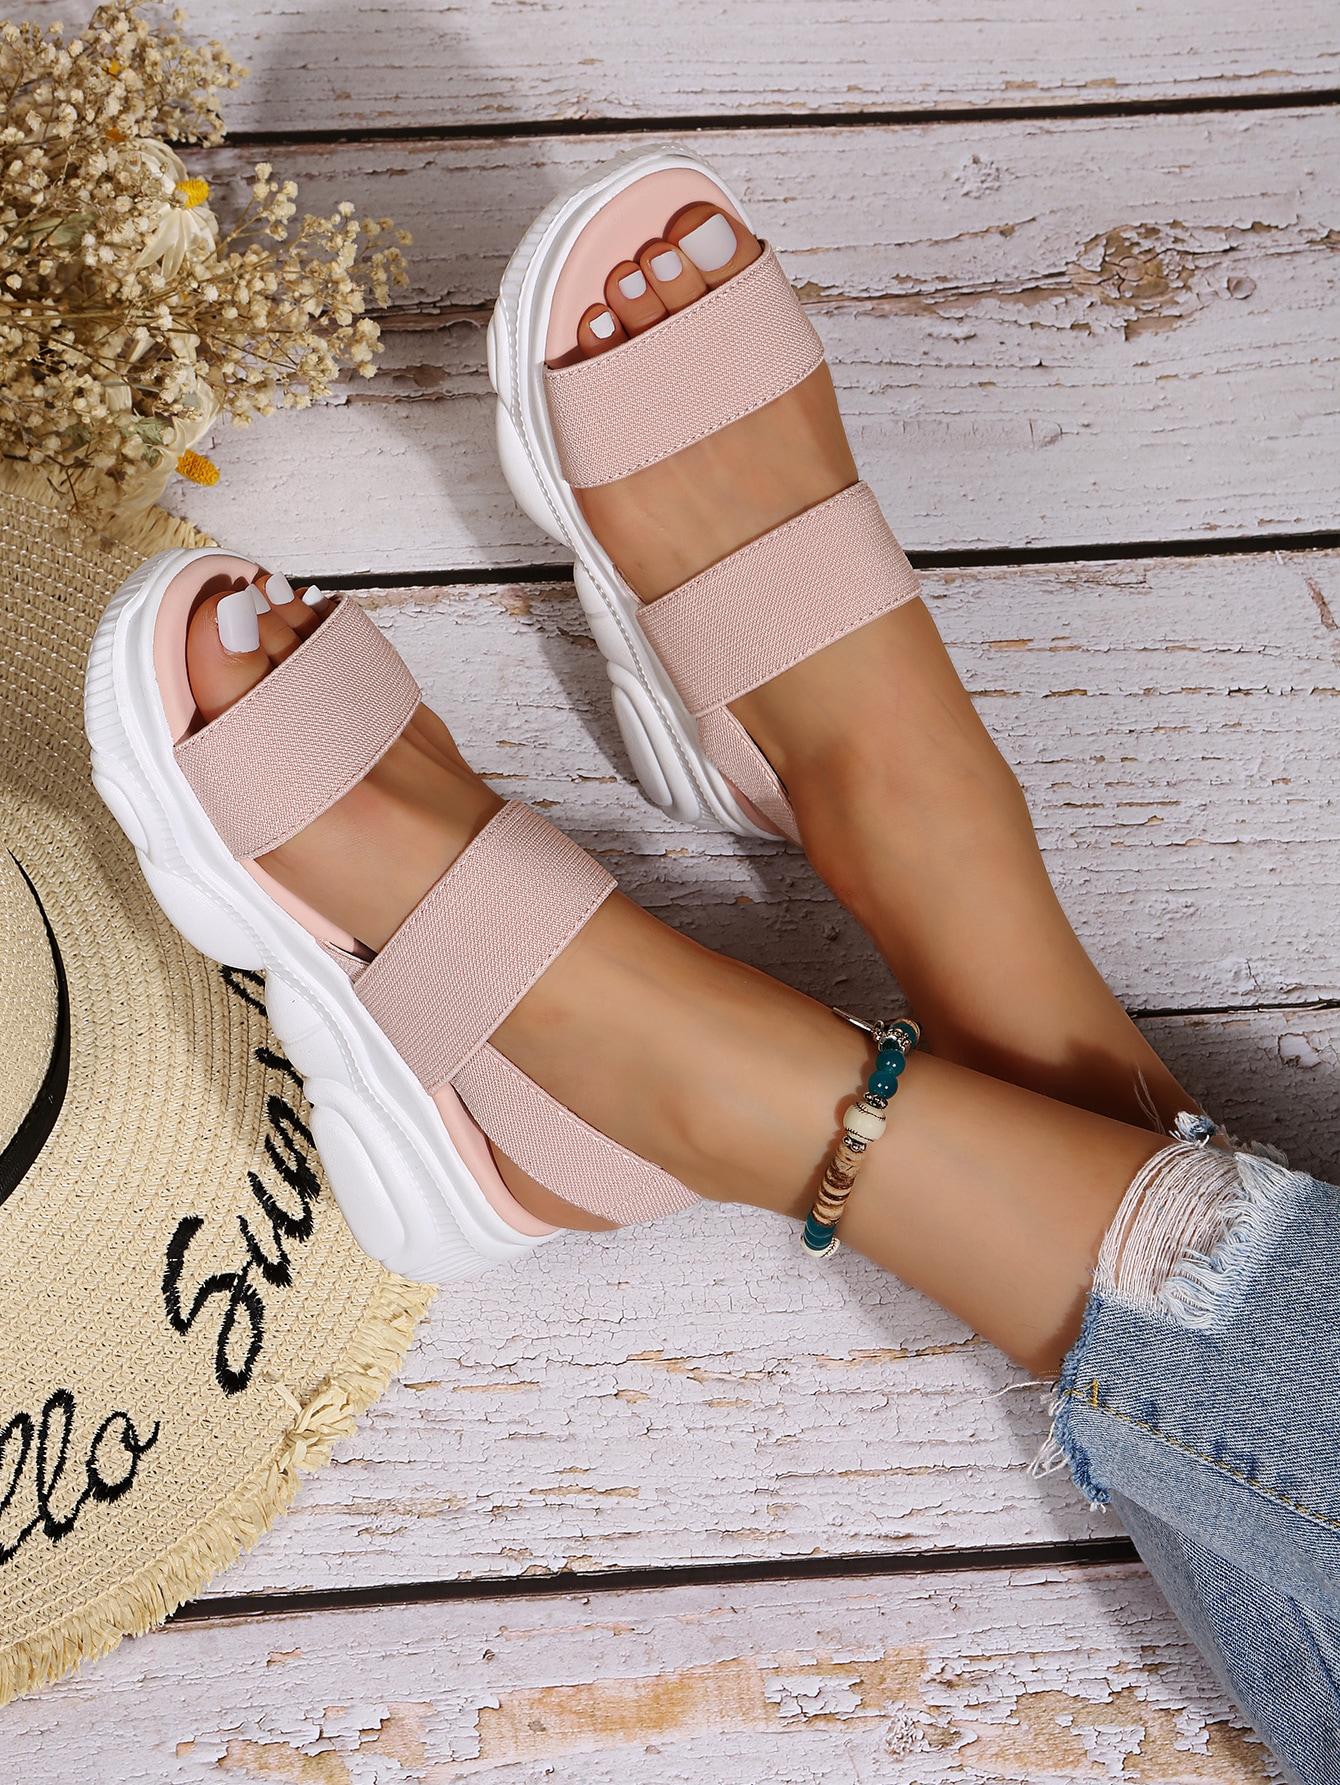 Minimalist Wedge Sandals